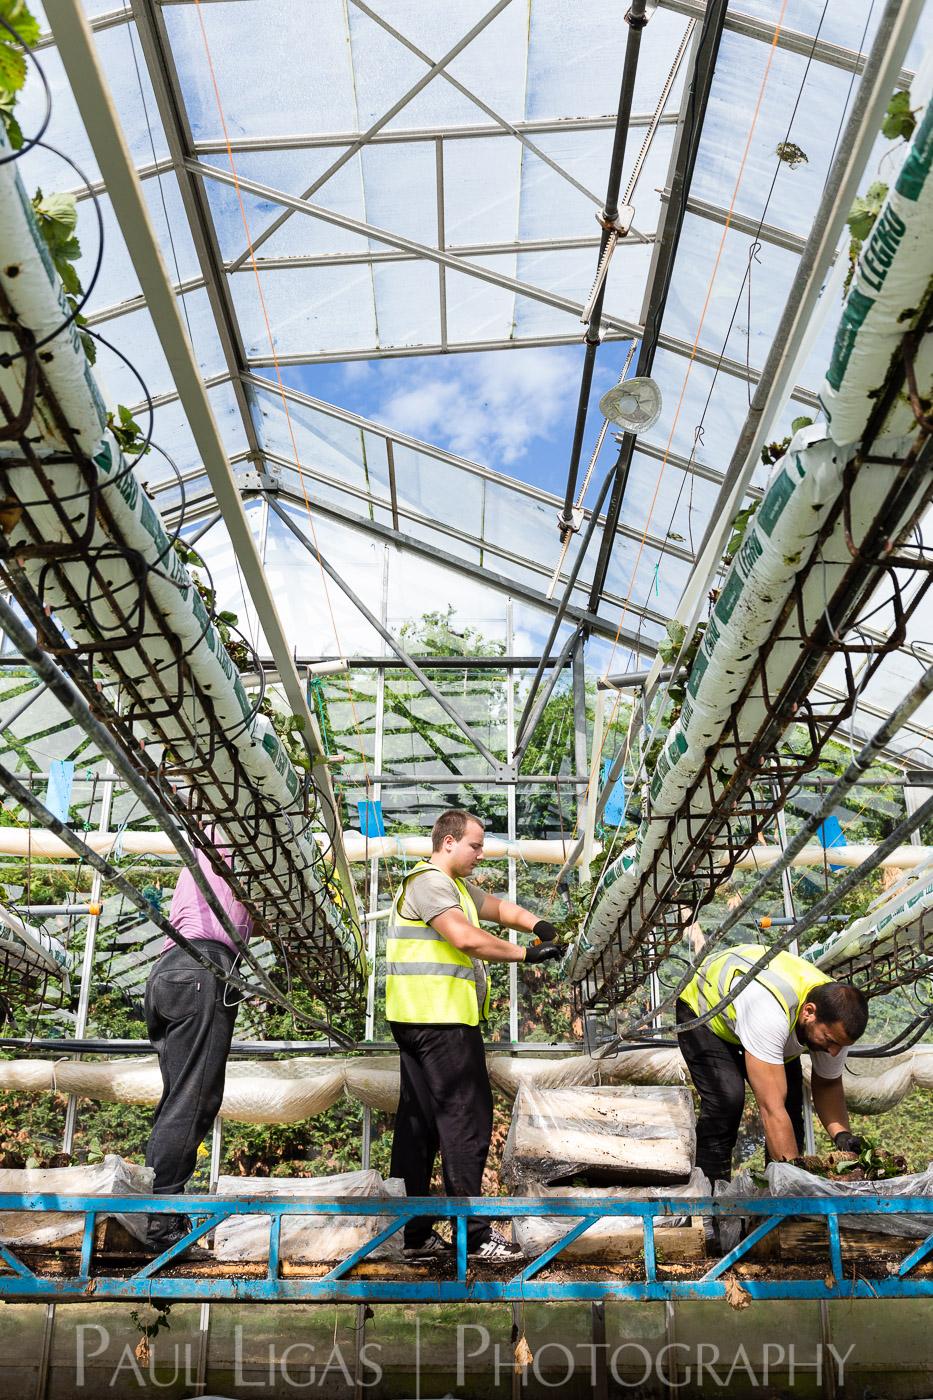 Haygrove Limited, Ledbury, Herefordshire farming agriculture photographer photography 3475